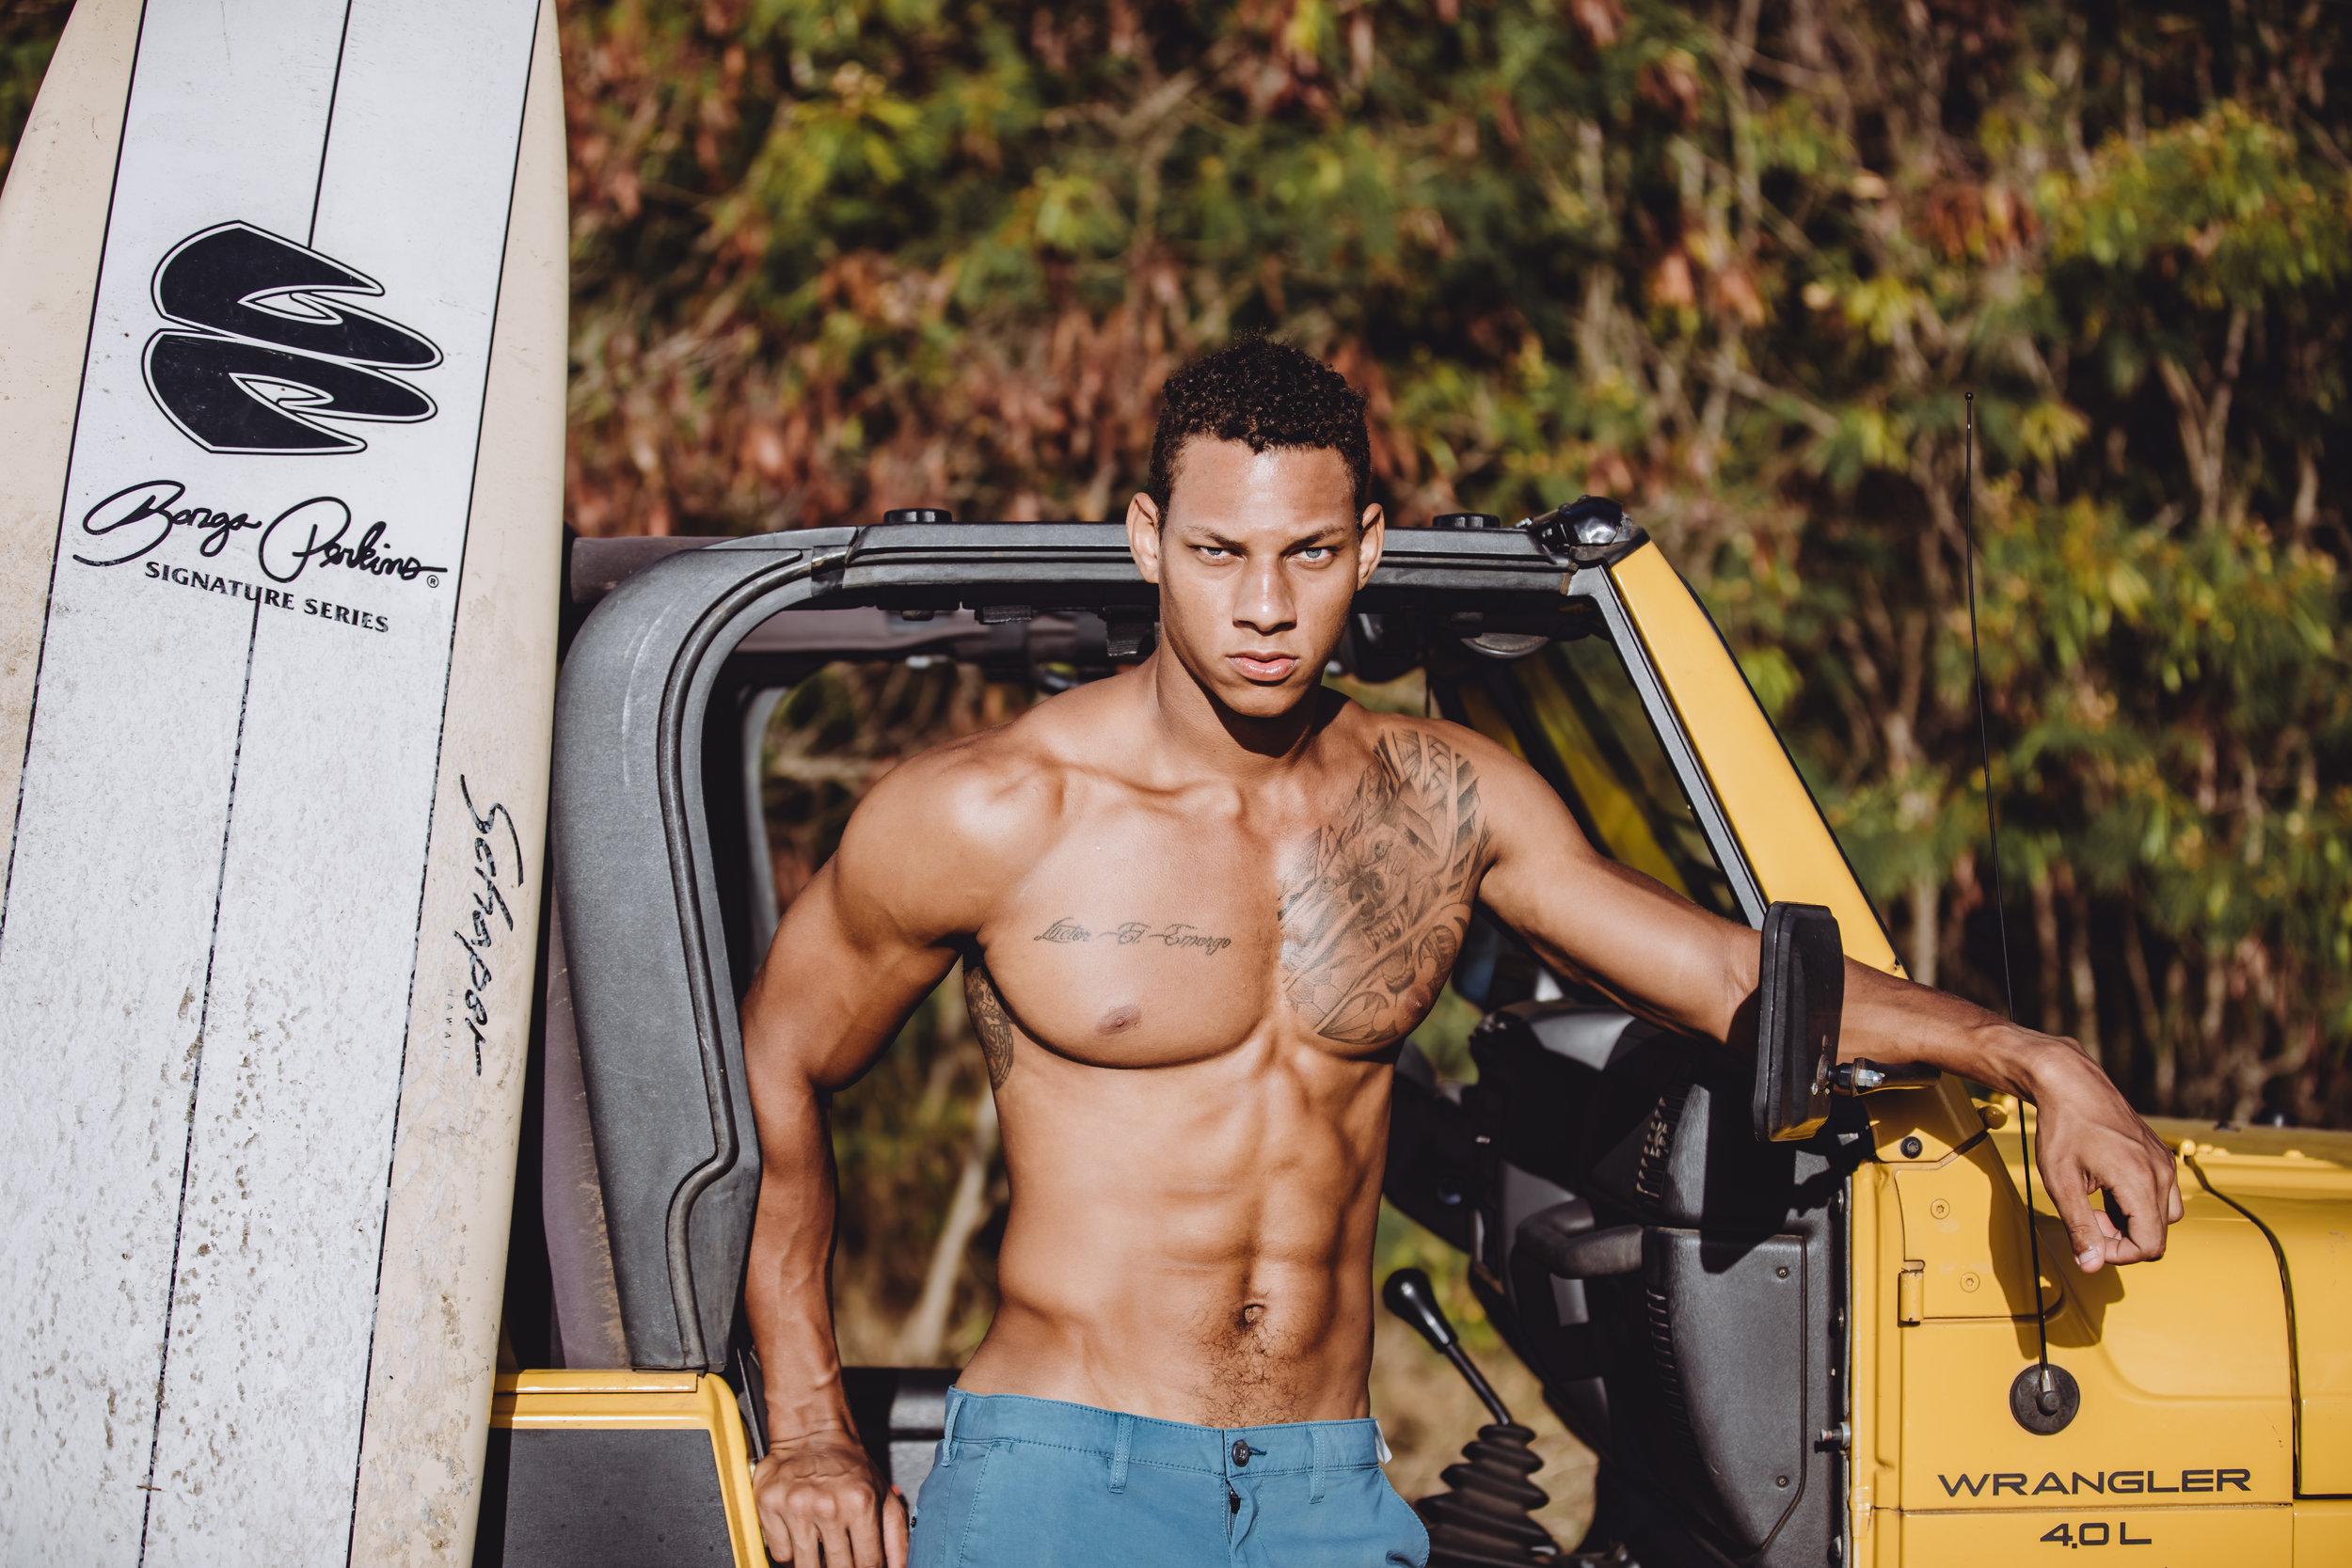 Premier model agency honolulu - jacob - fitness model with surf board - waimanalo beach hawaii fitness photographer.jpg